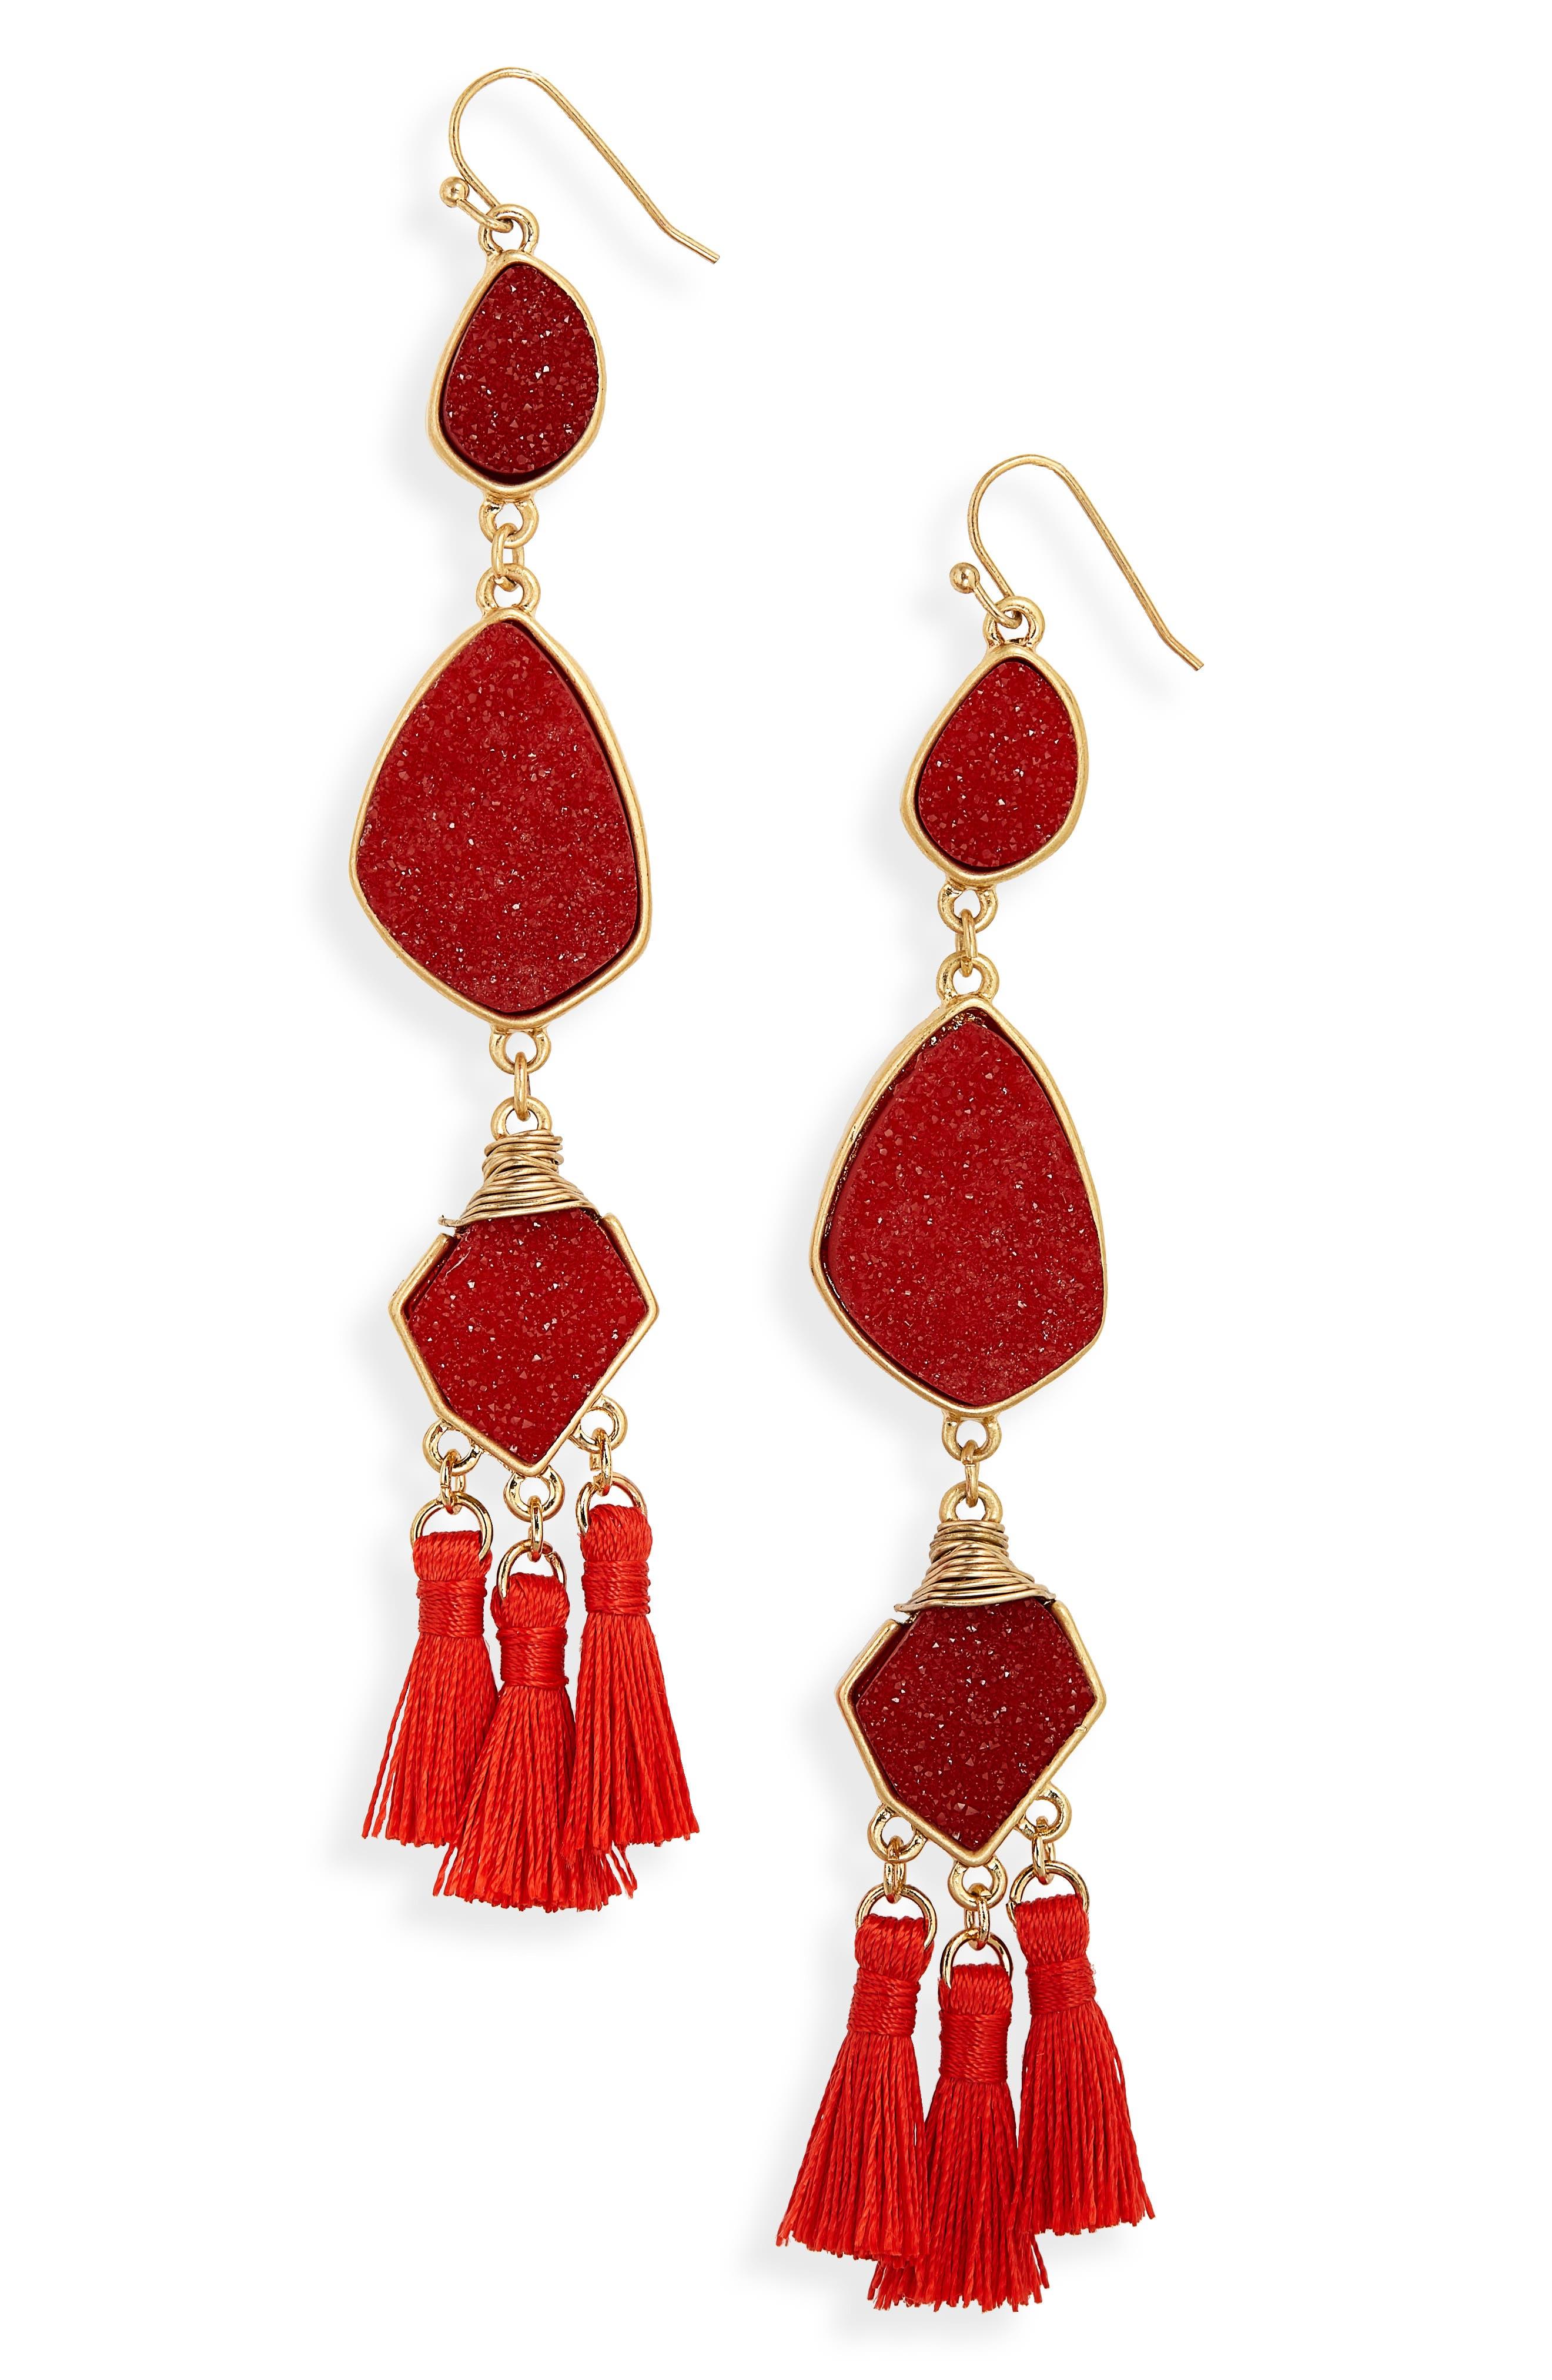 PANACEA Drusy Tassel Earrings in Red